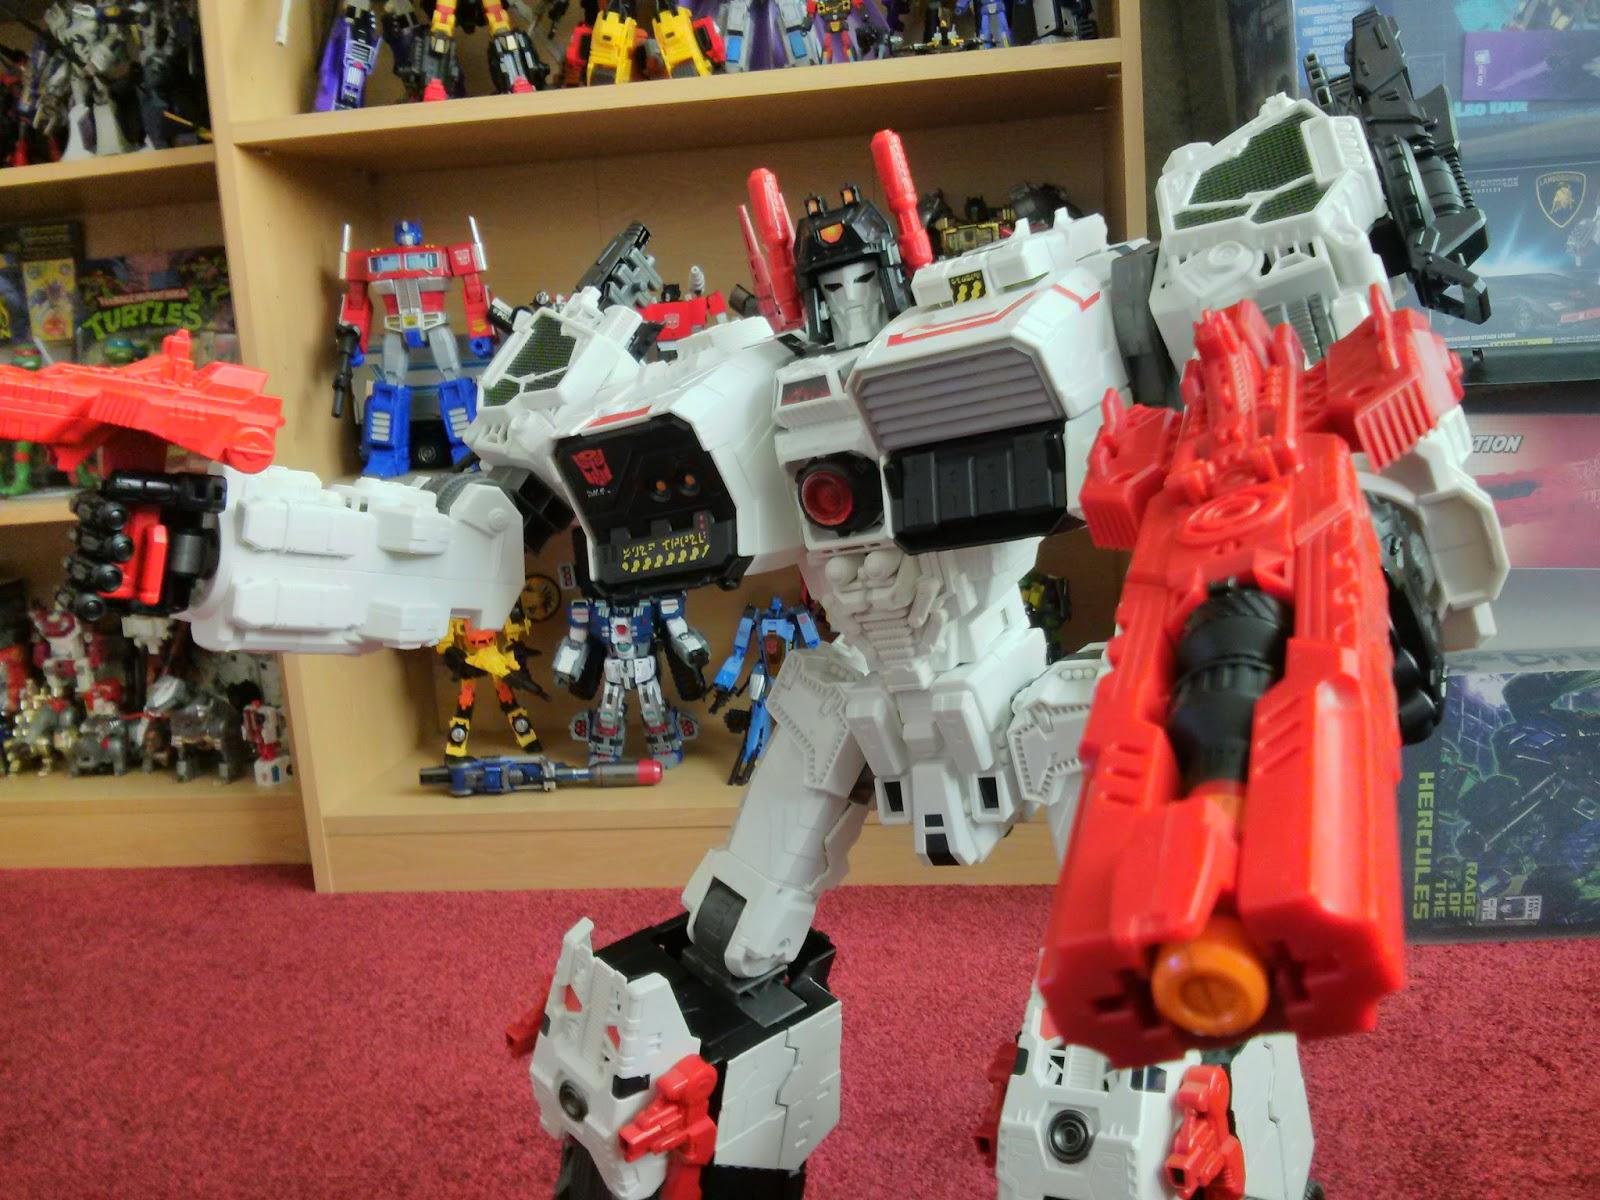 x2 toys metroplex gun in Metroplexs hand